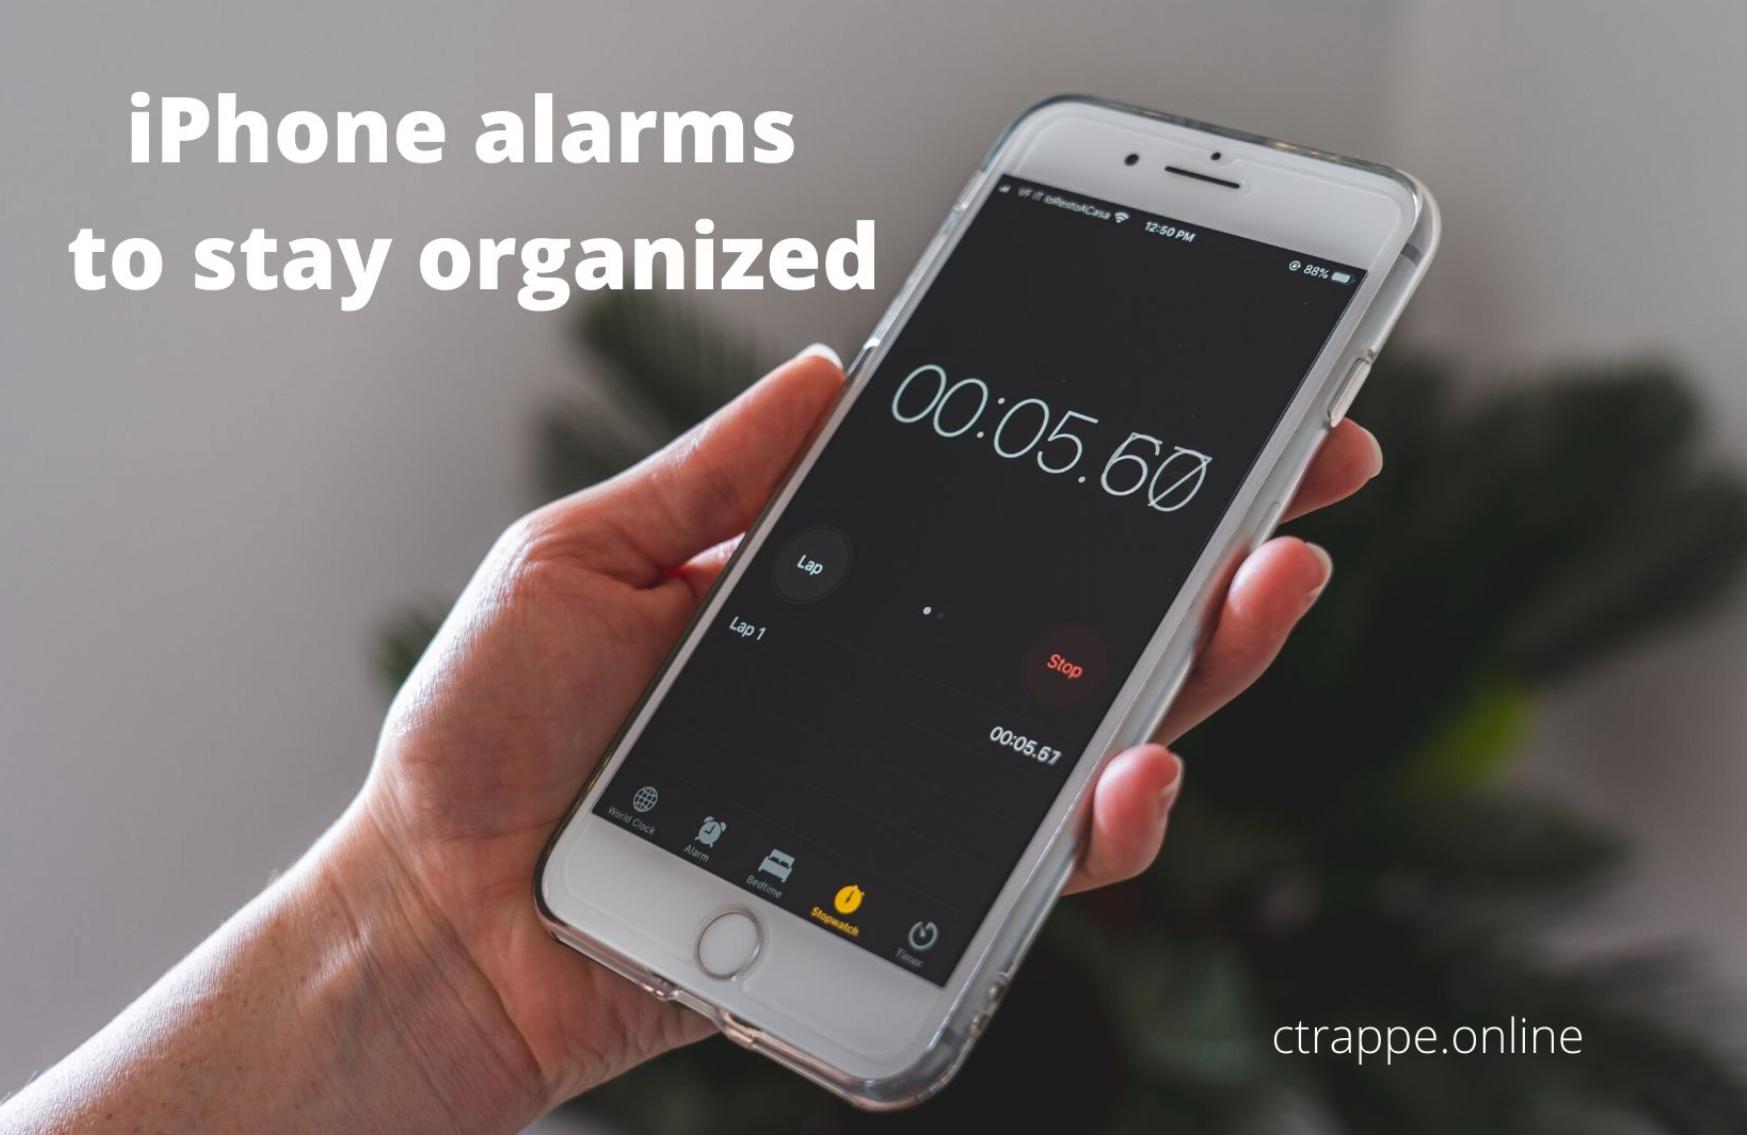 Setting an iPhone alarm